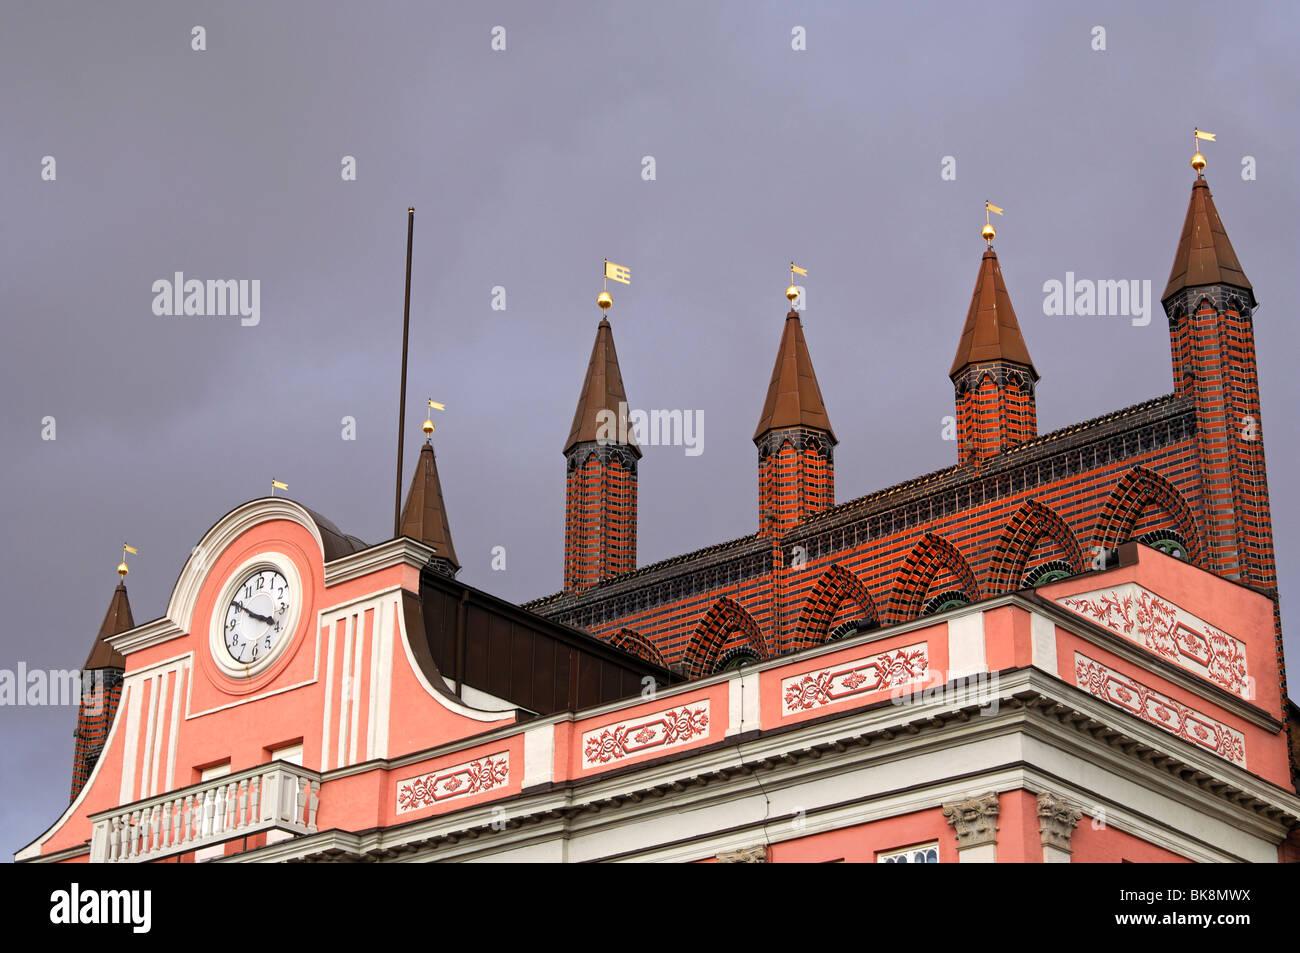 Townhall of Rostock, building in brick gothic, Rostock, Mecklenburg-Vorpommern, Germany - Stock Image